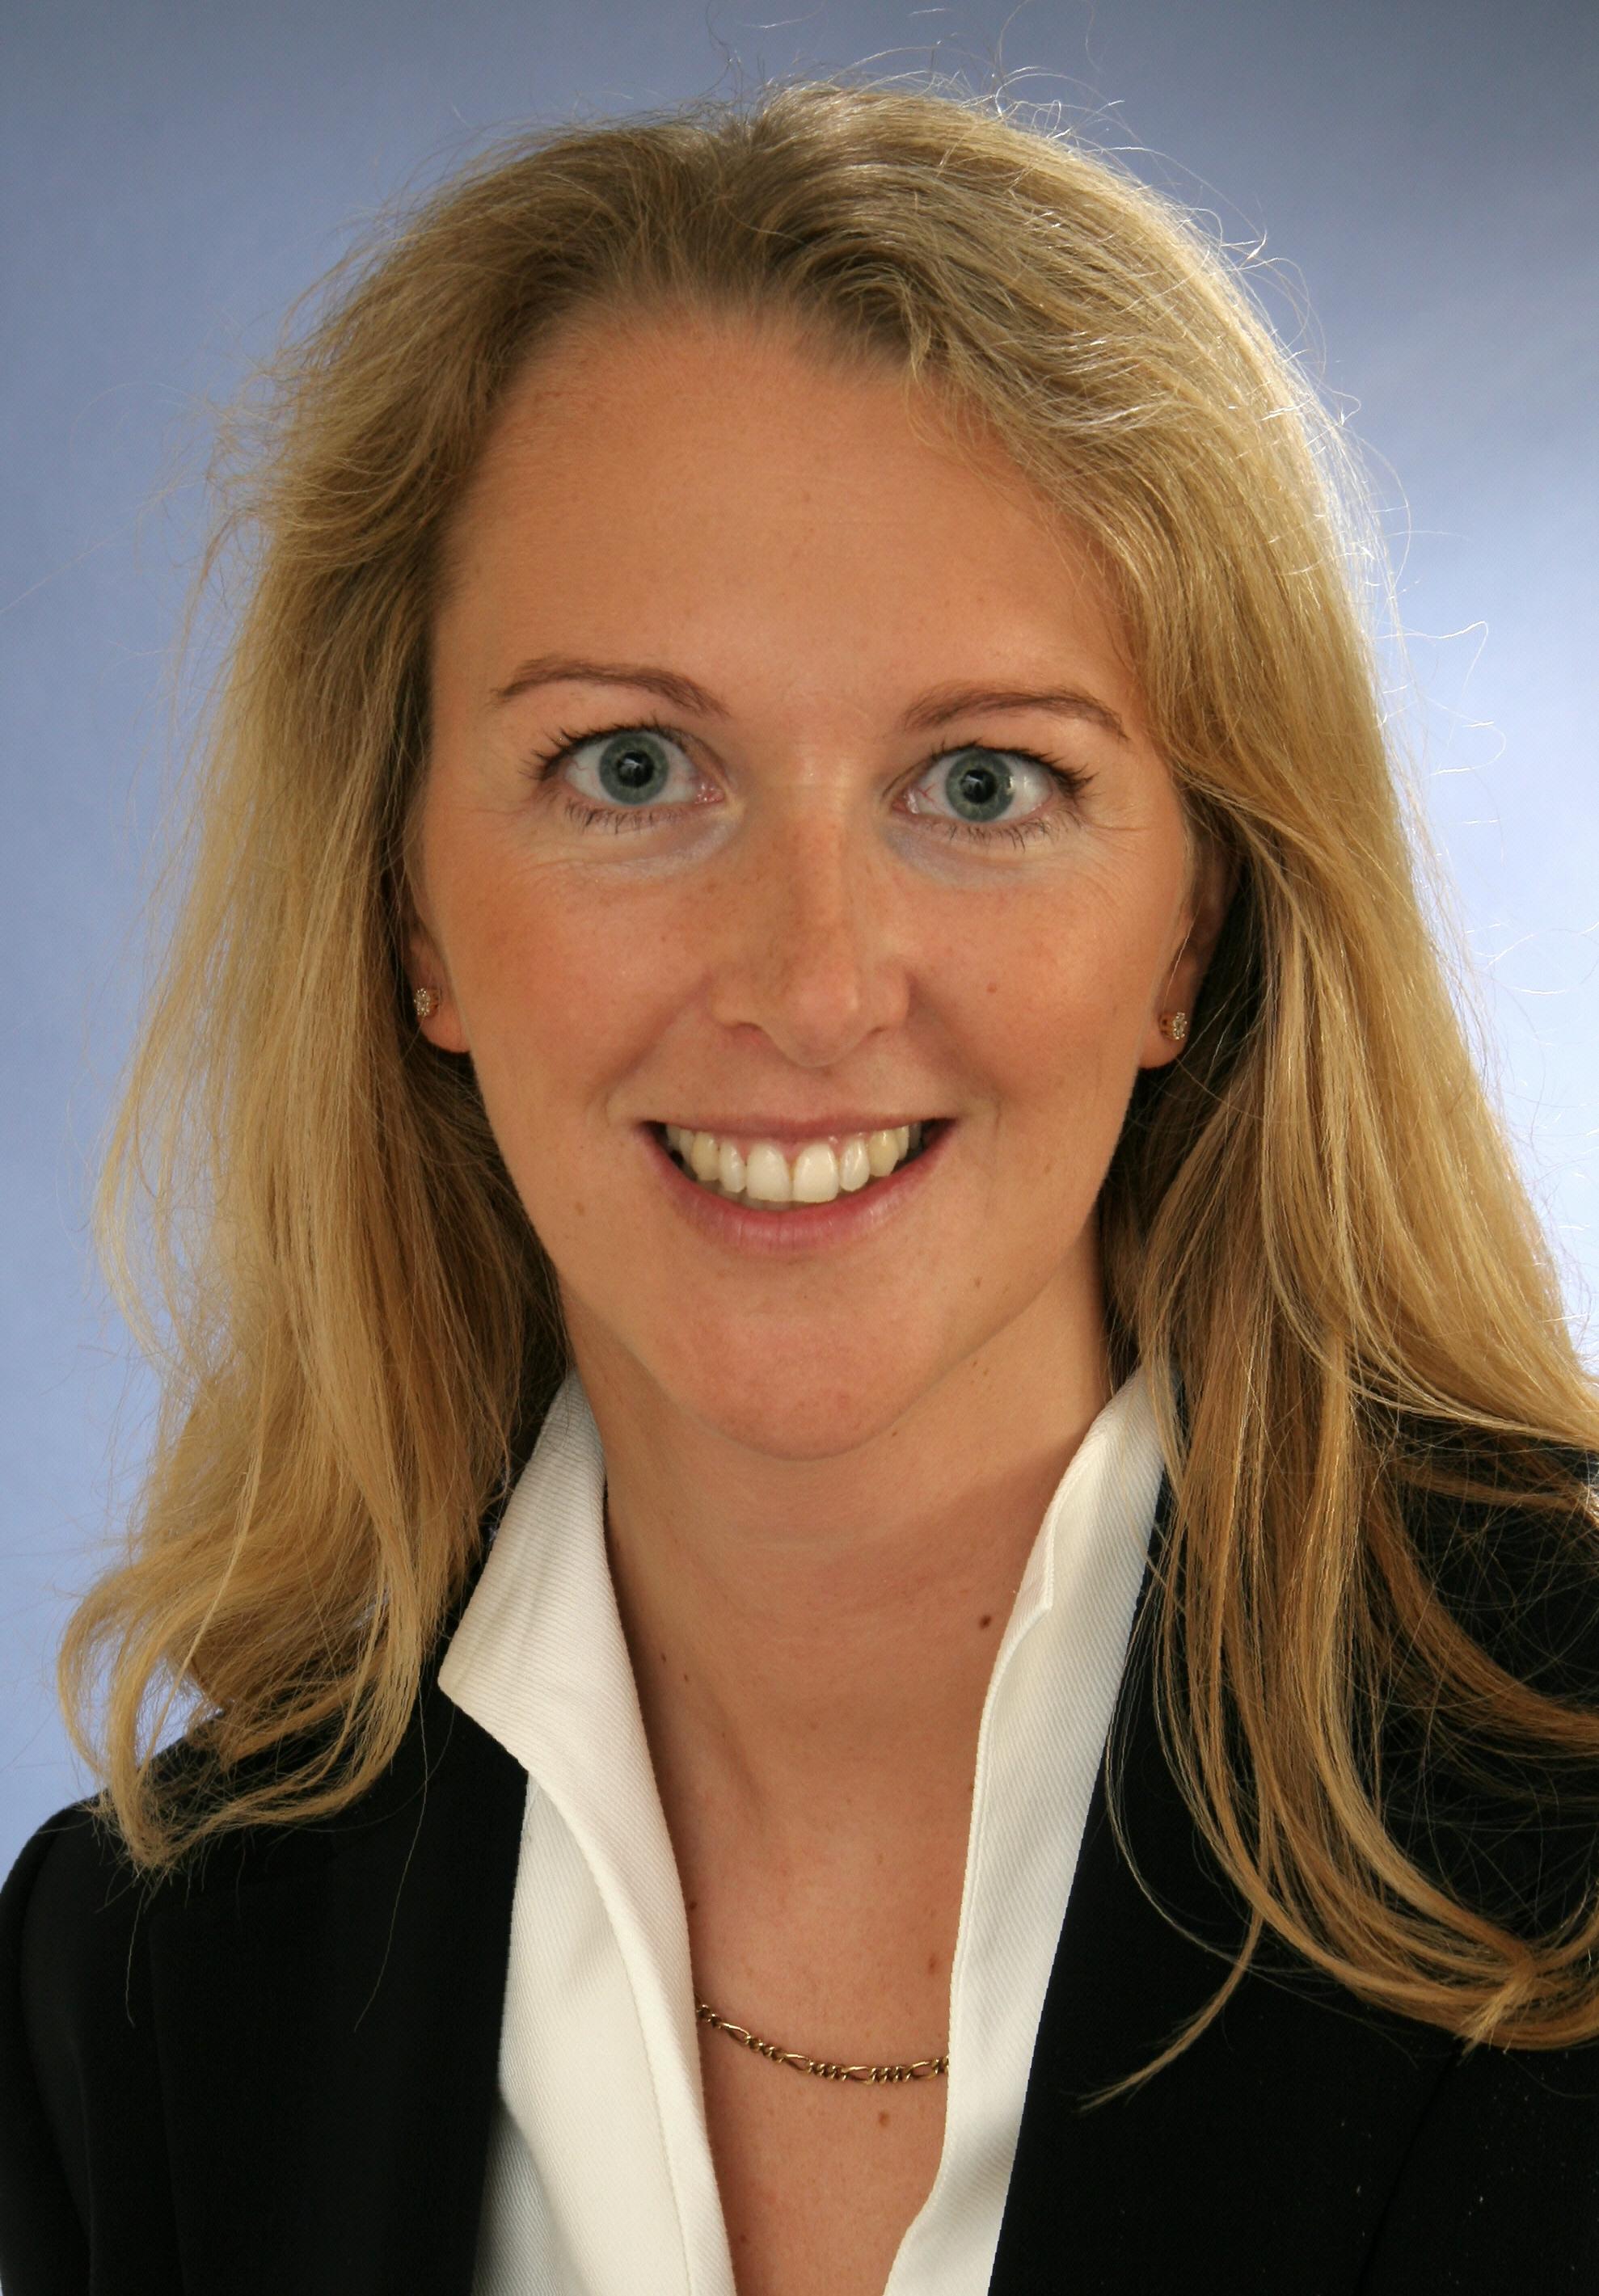 Prof. Dr. Silke Finken